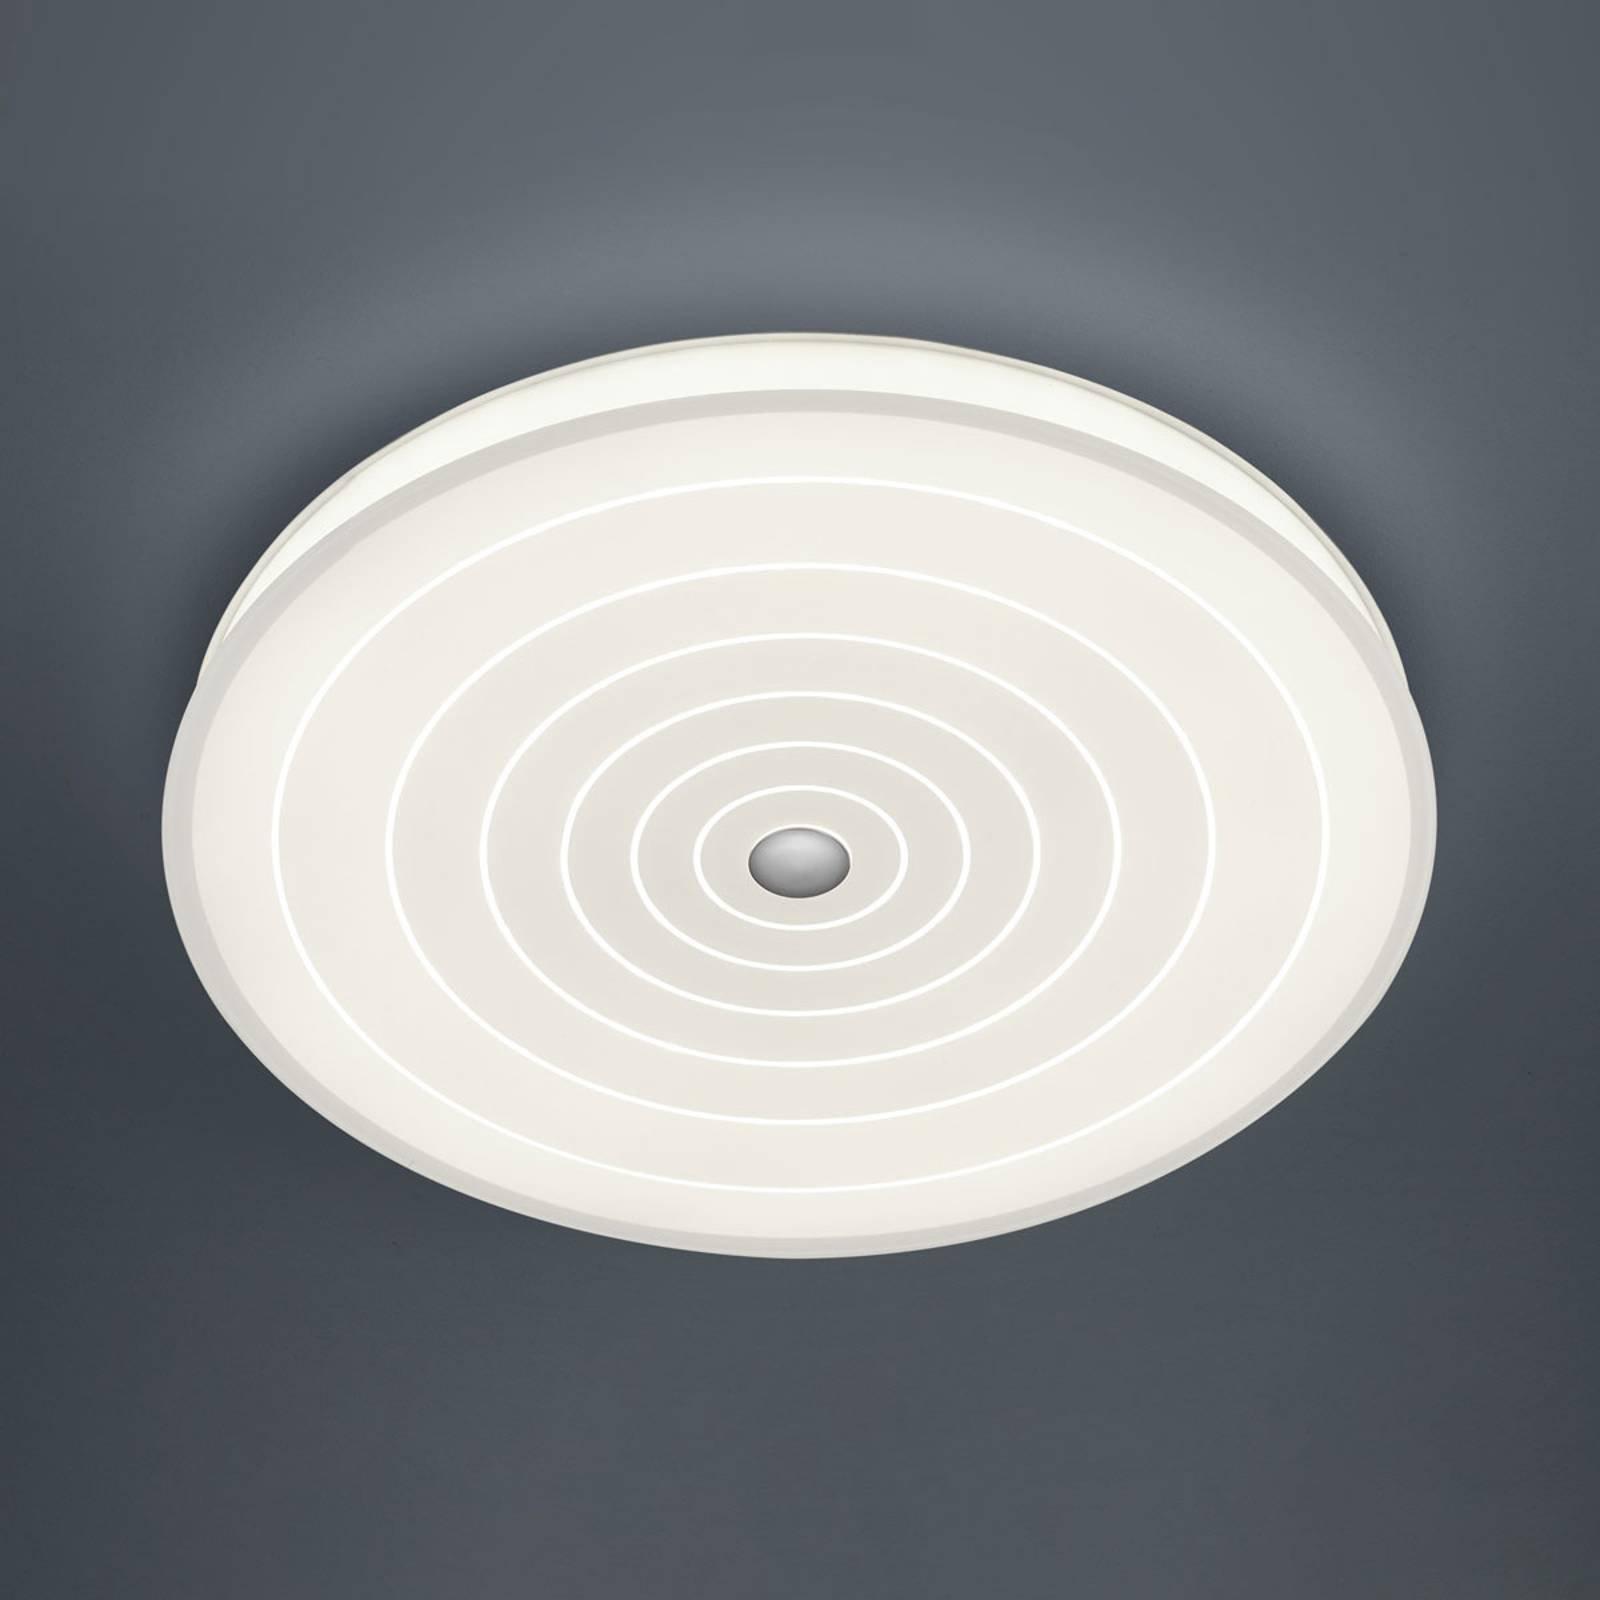 BANKAMP Mandala LED-taklampe sirkler, Ø 42 cm